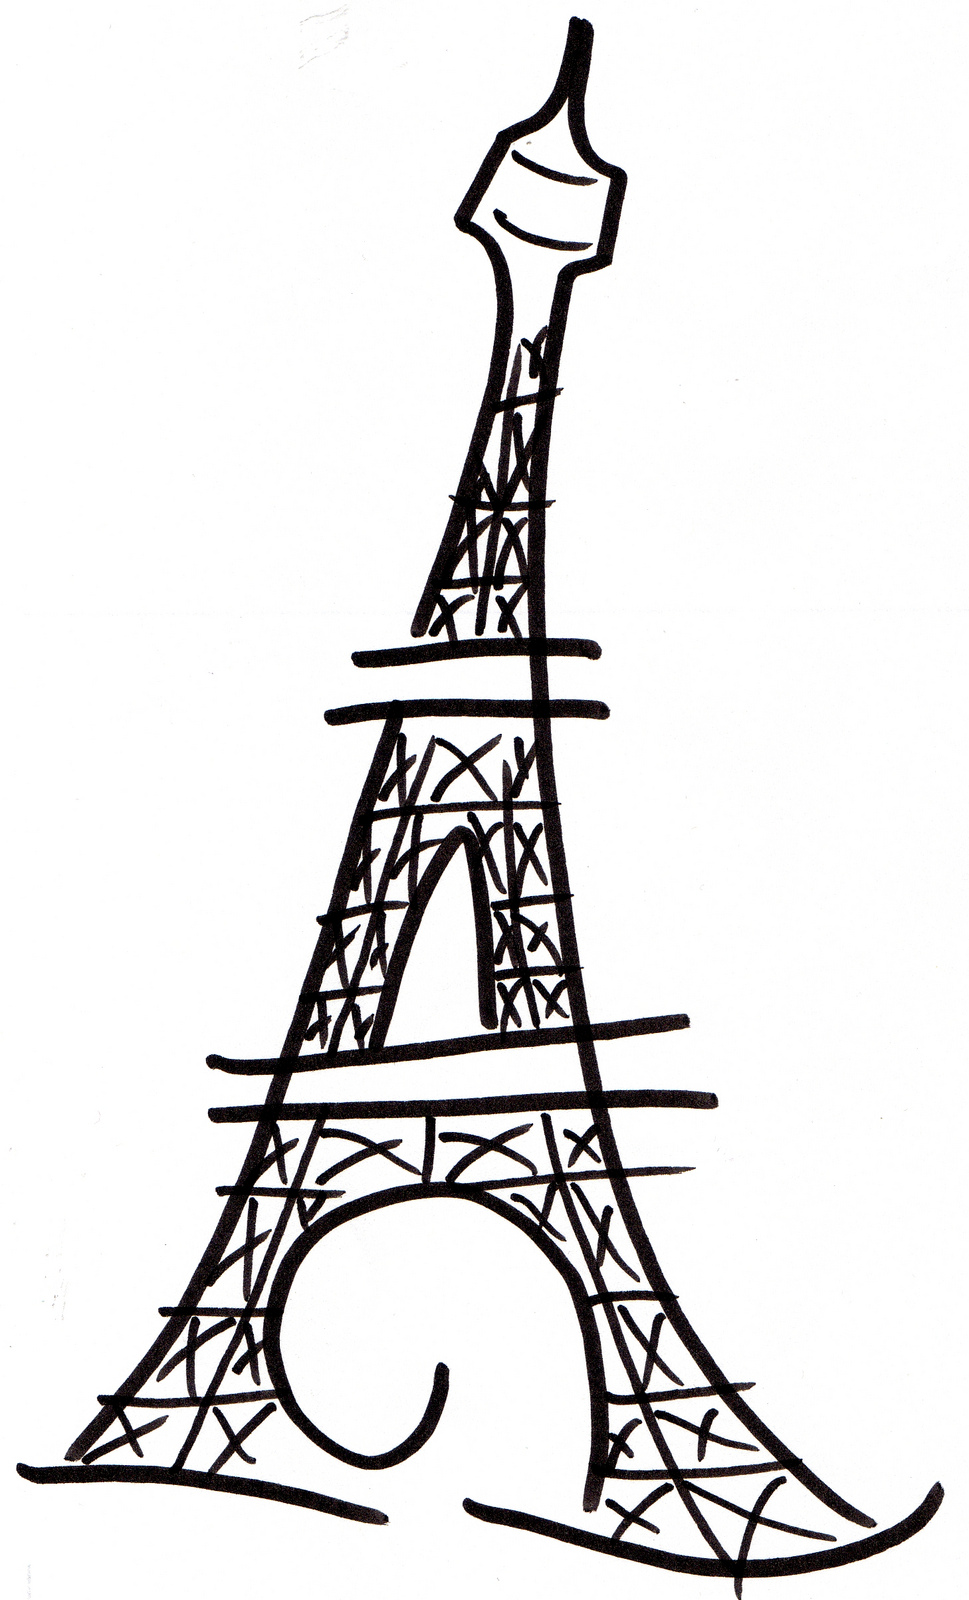 969x1600 Eiffel Tower Clipart Image Clip Art The Eiffel